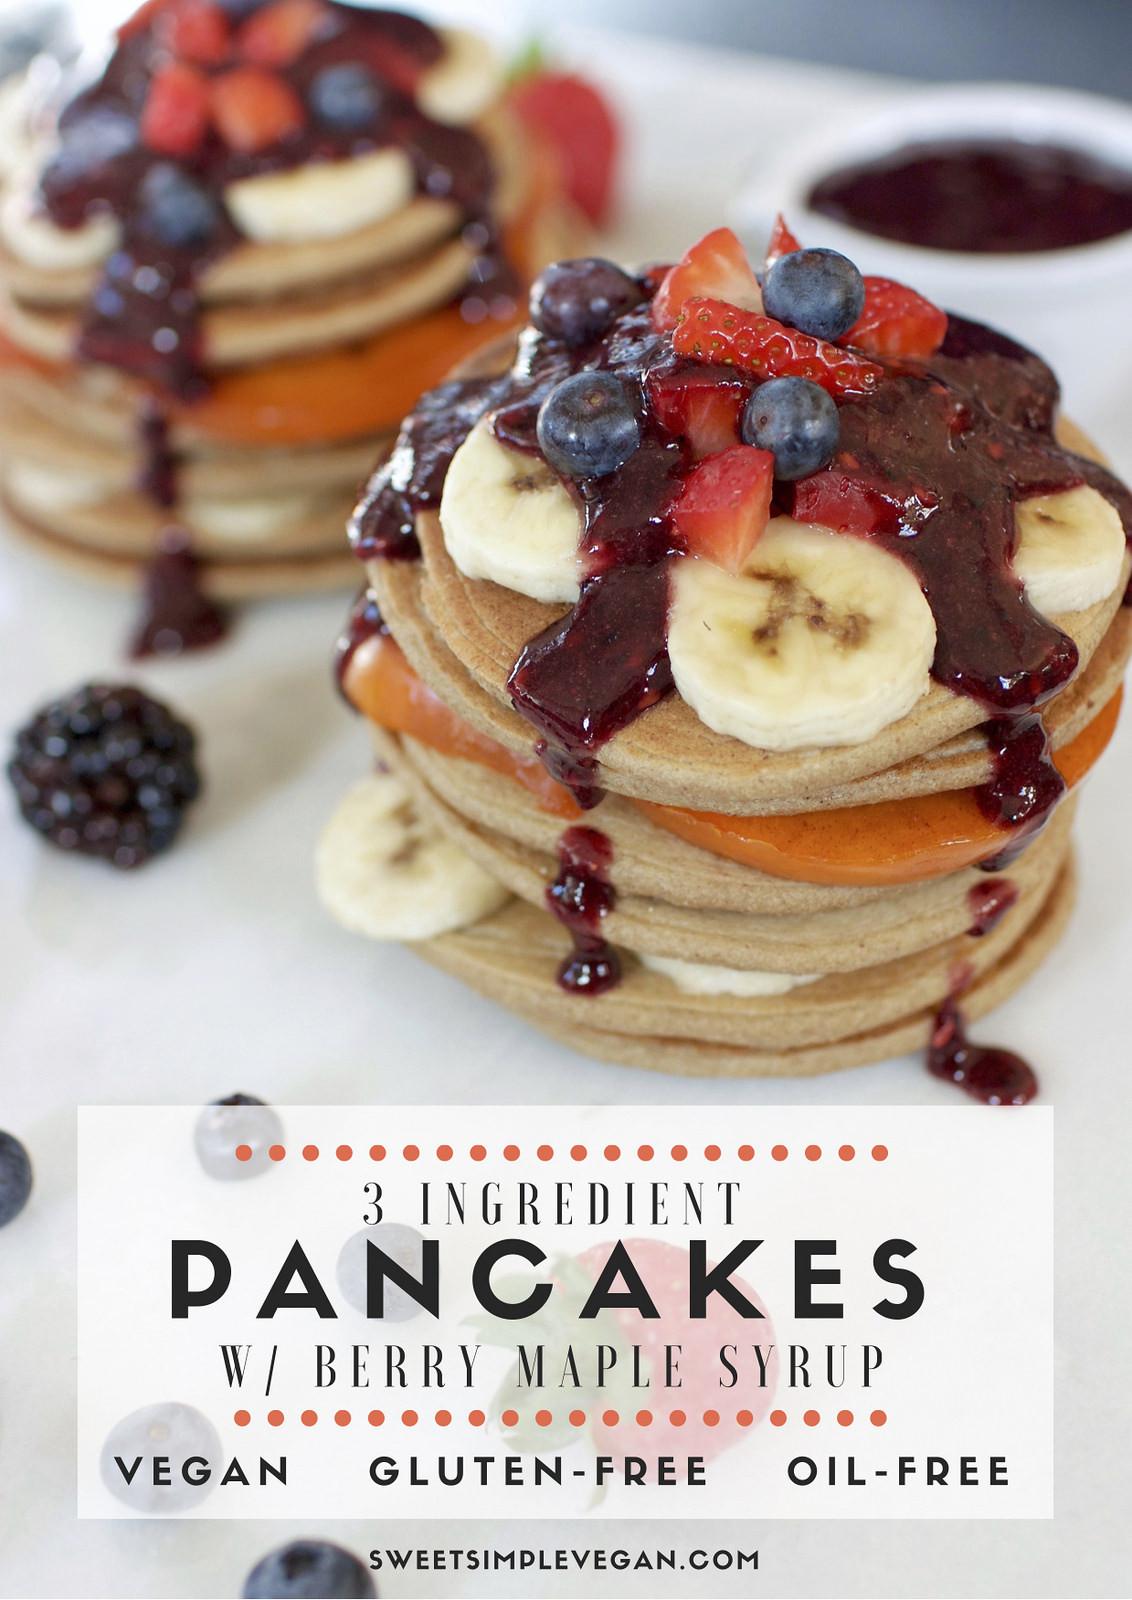 Healthy Vegan Pancakes  Healthy 3 Ingre nt Vegan Pancakes gluten & oil free